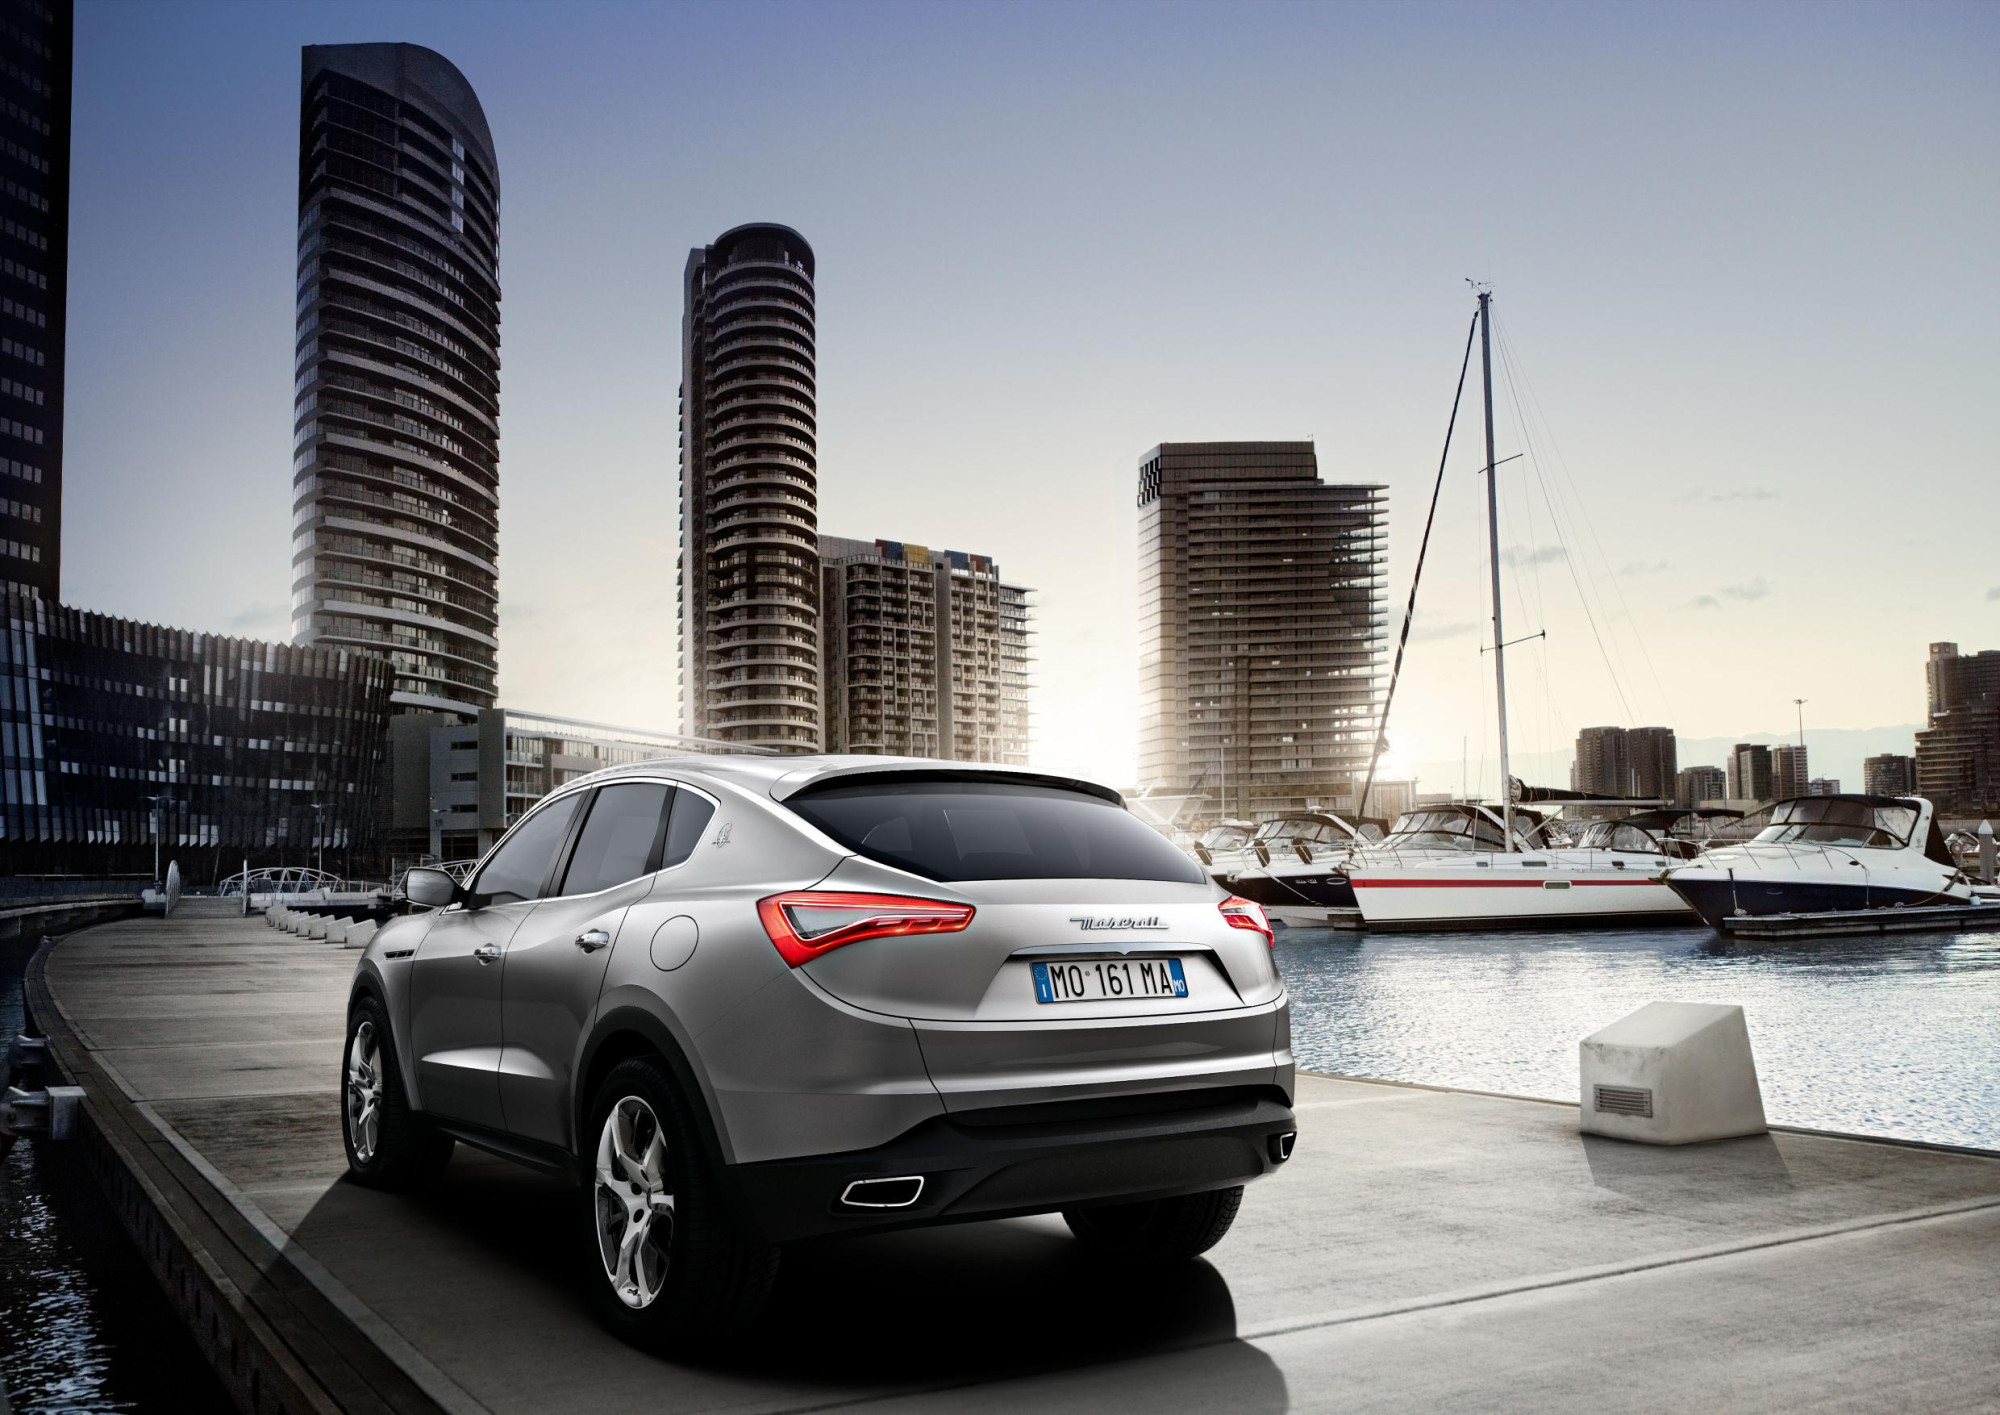 Hemi Car Wallpaper Maserati Unveils 2011 Kubang Luxury Performance Suv